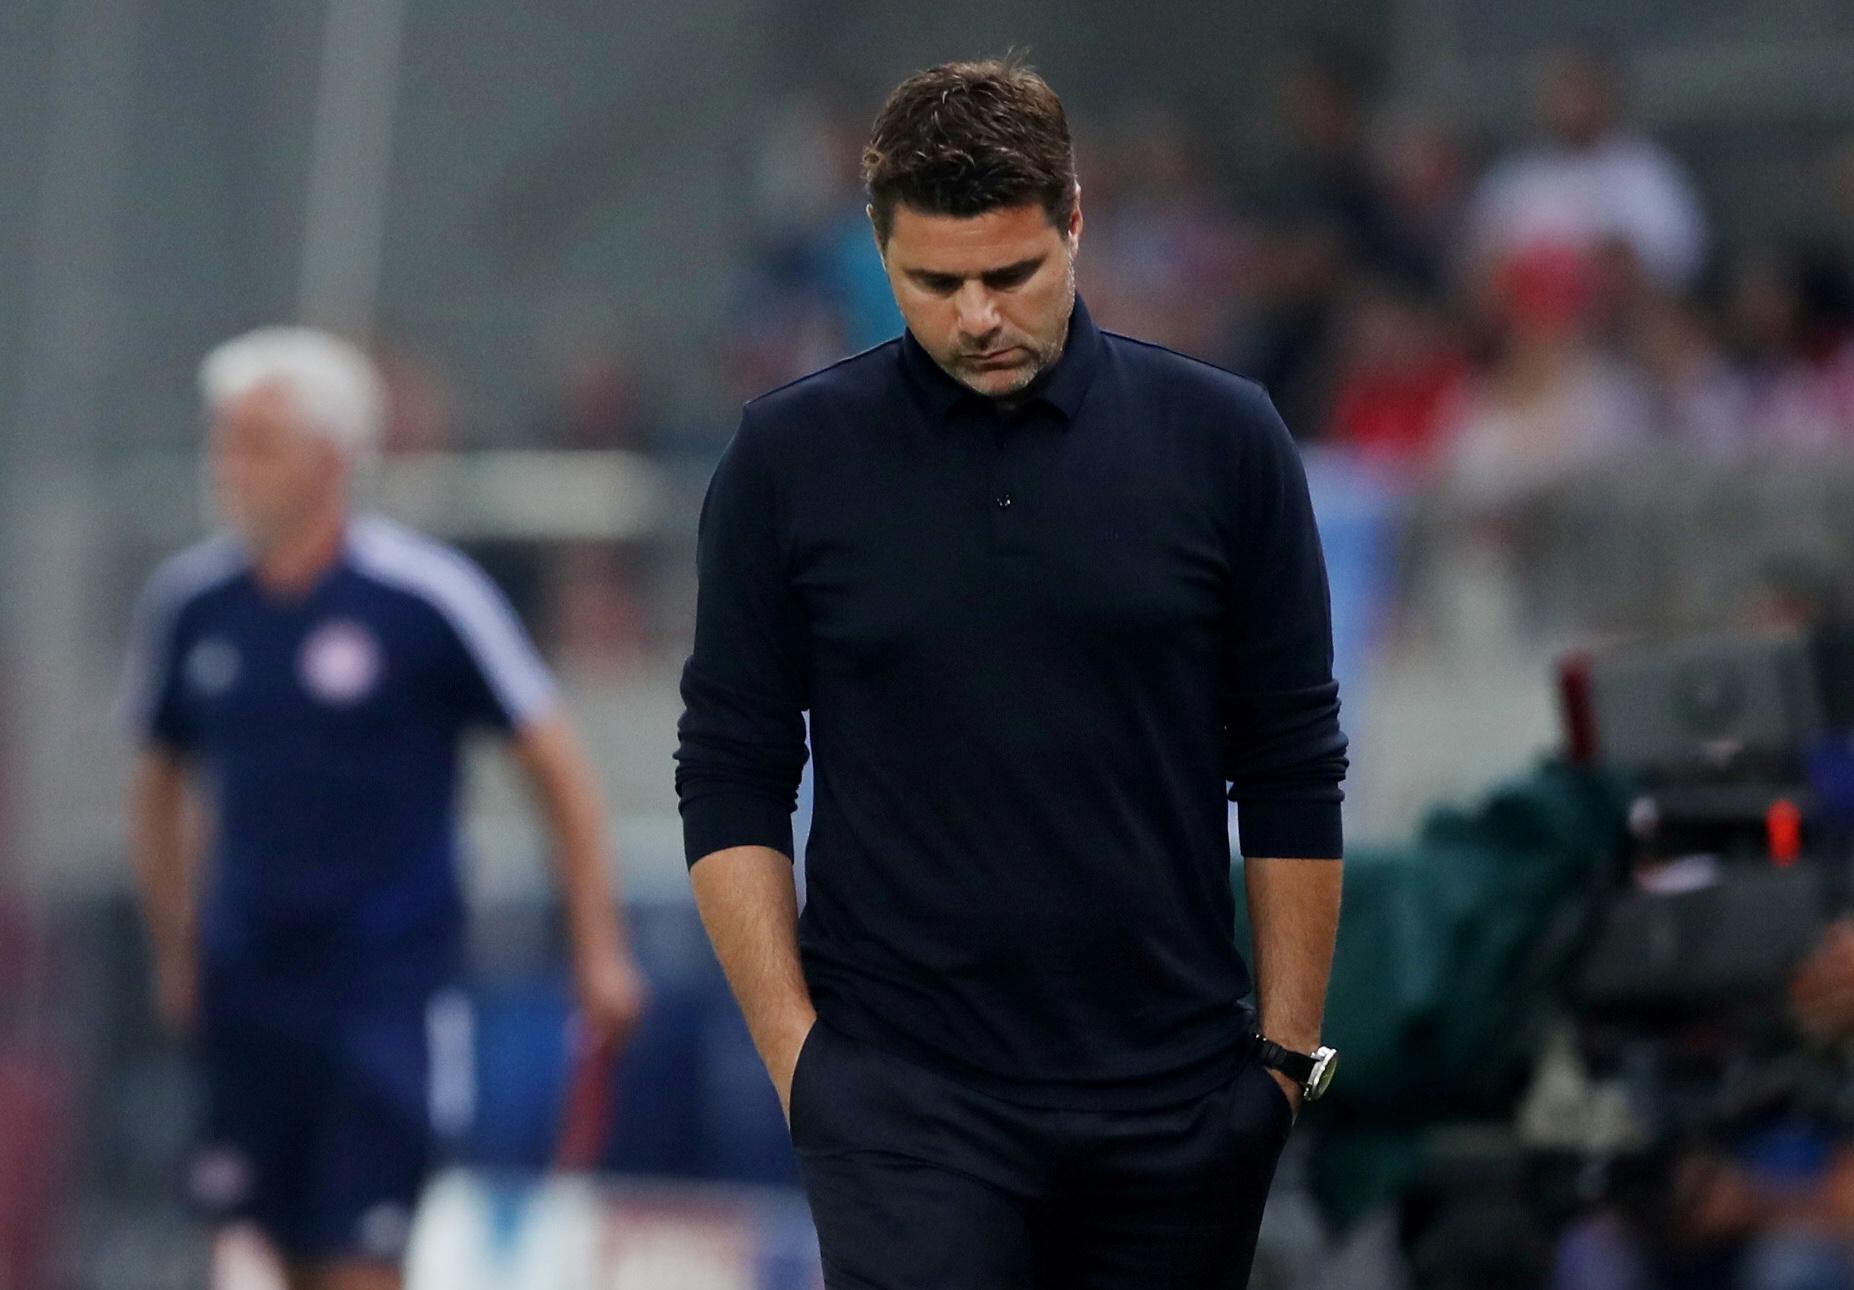 Pochettino Wants To Coach The Argentina National Team